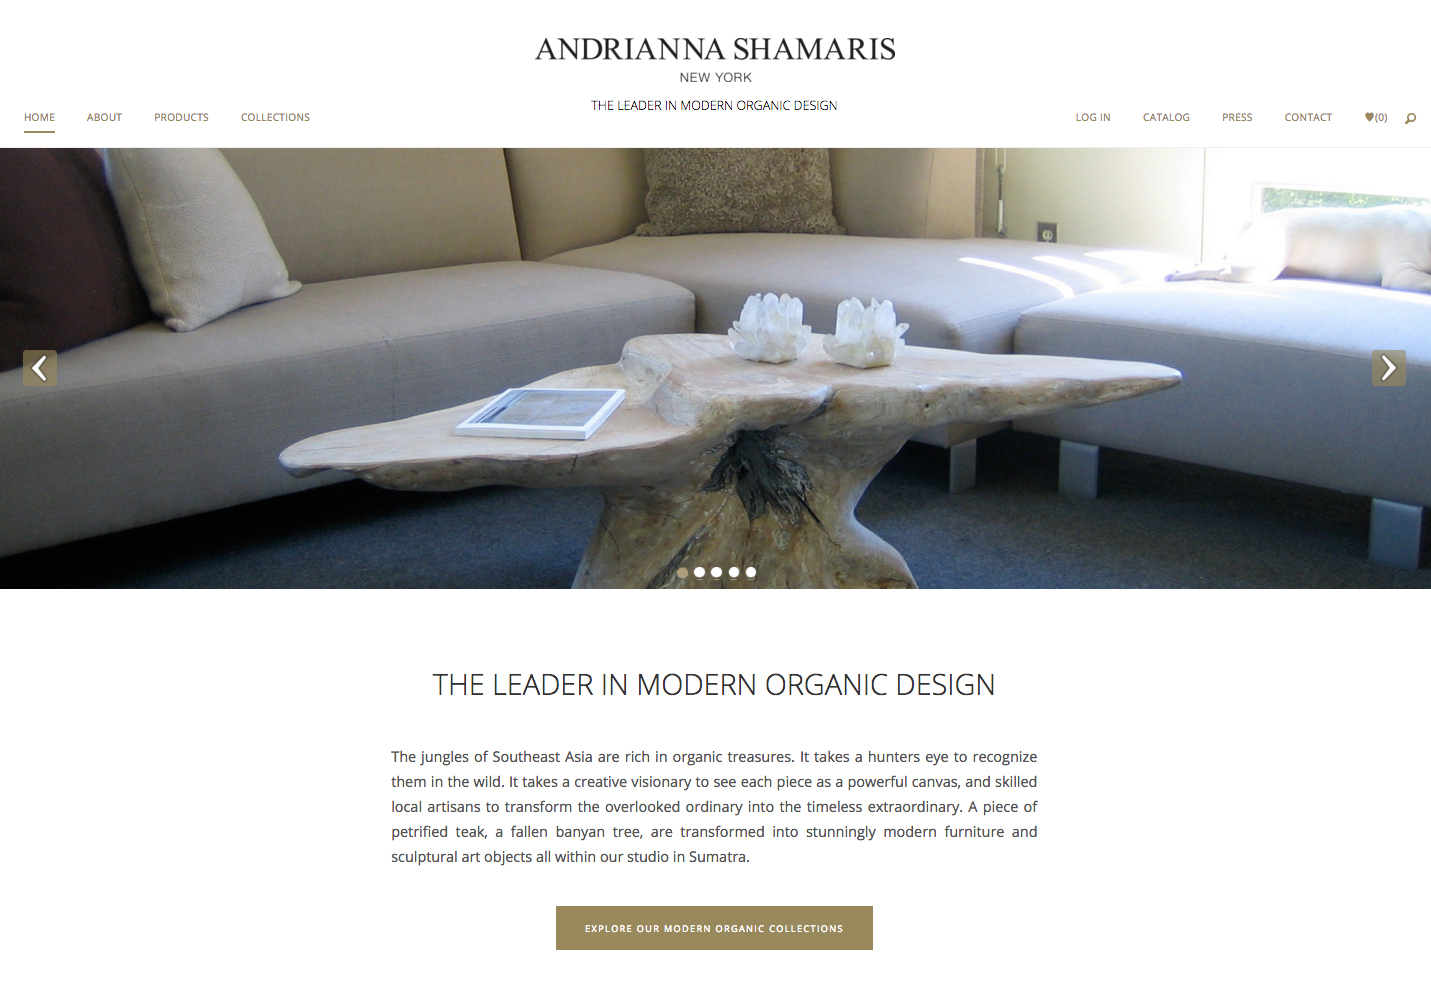 Andrianna Shamaris